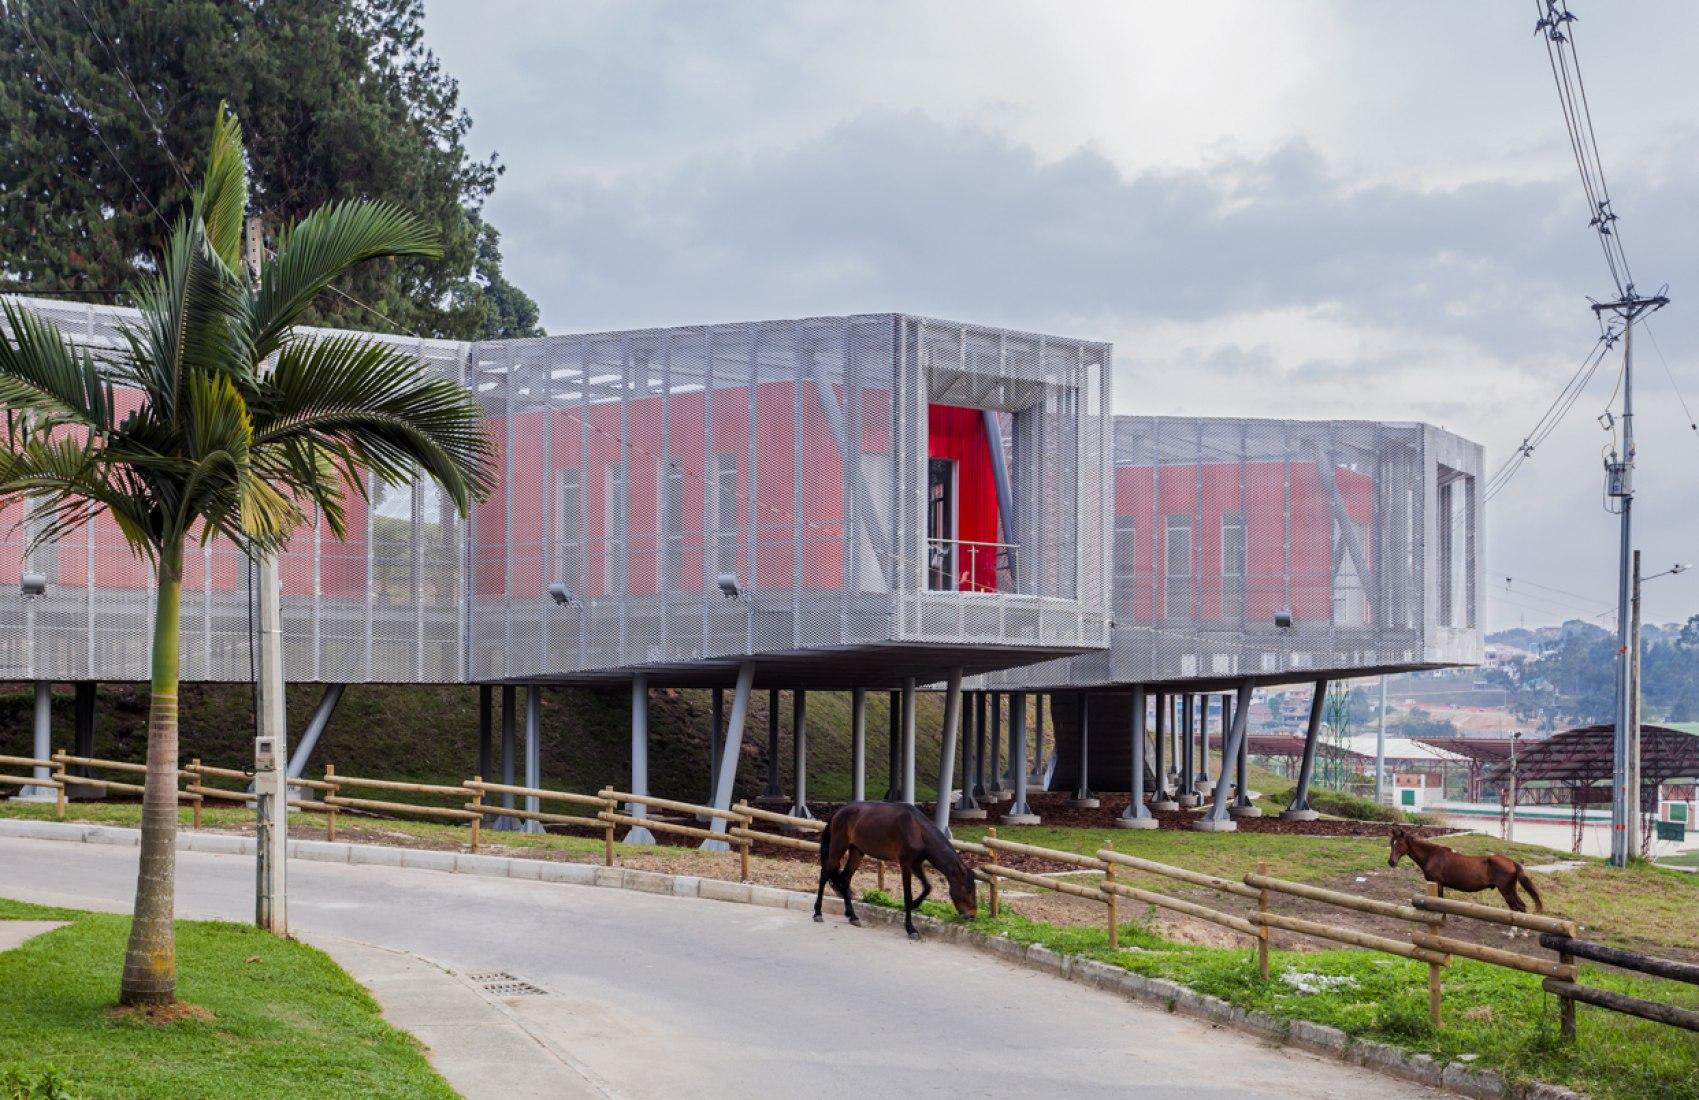 Outside view of the Educational Park of Marinilla by El Equipo de Mazzanti. Photograph © Rodrigo Dávila.